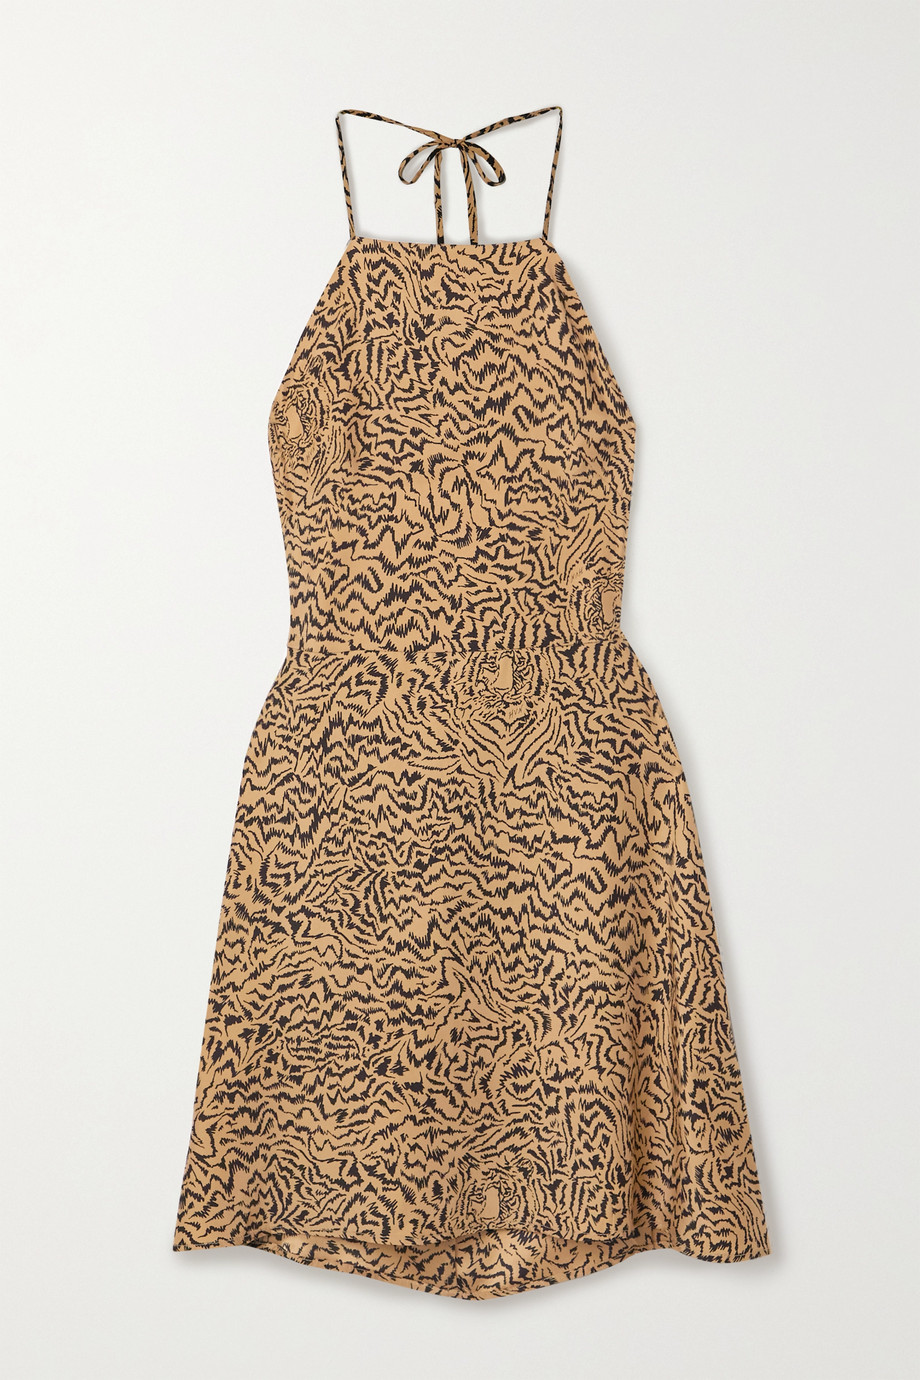 HVN Reece tiger-print silk crepe de chine halterneck mini dress